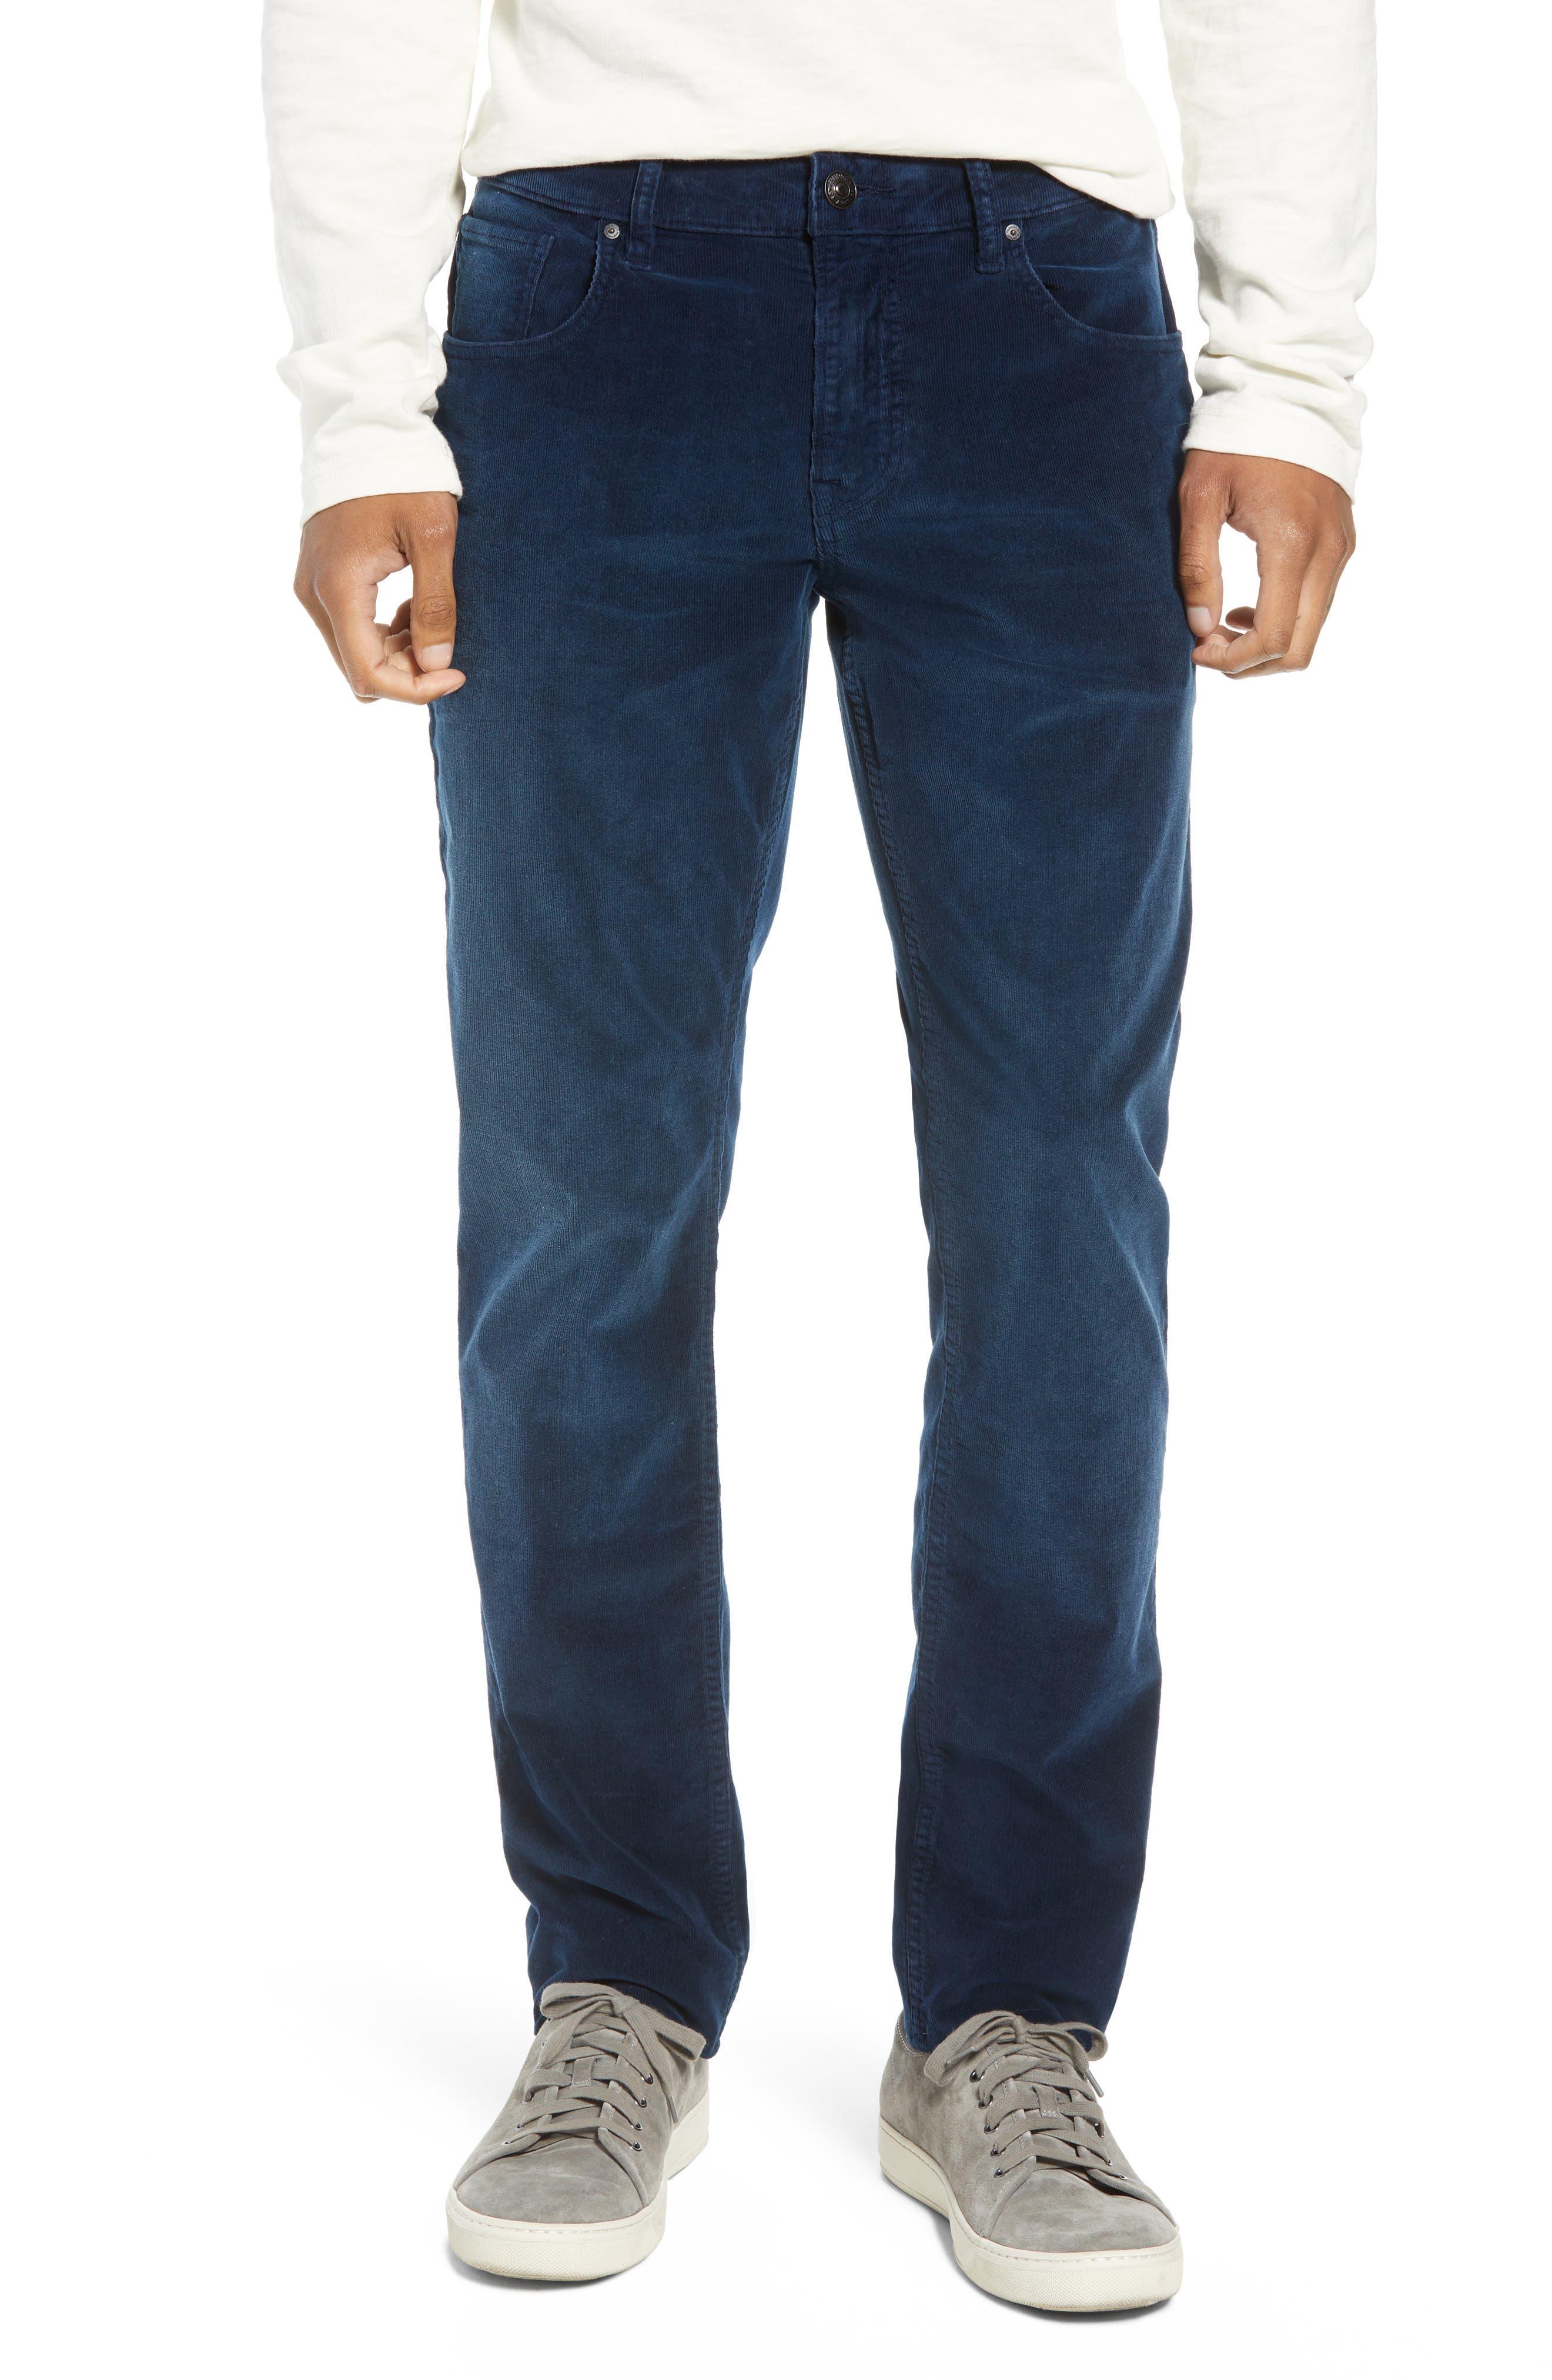 Blake Slim Fit Straight Leg Corduroy Pants,                             Main thumbnail 1, color,                             BLACK